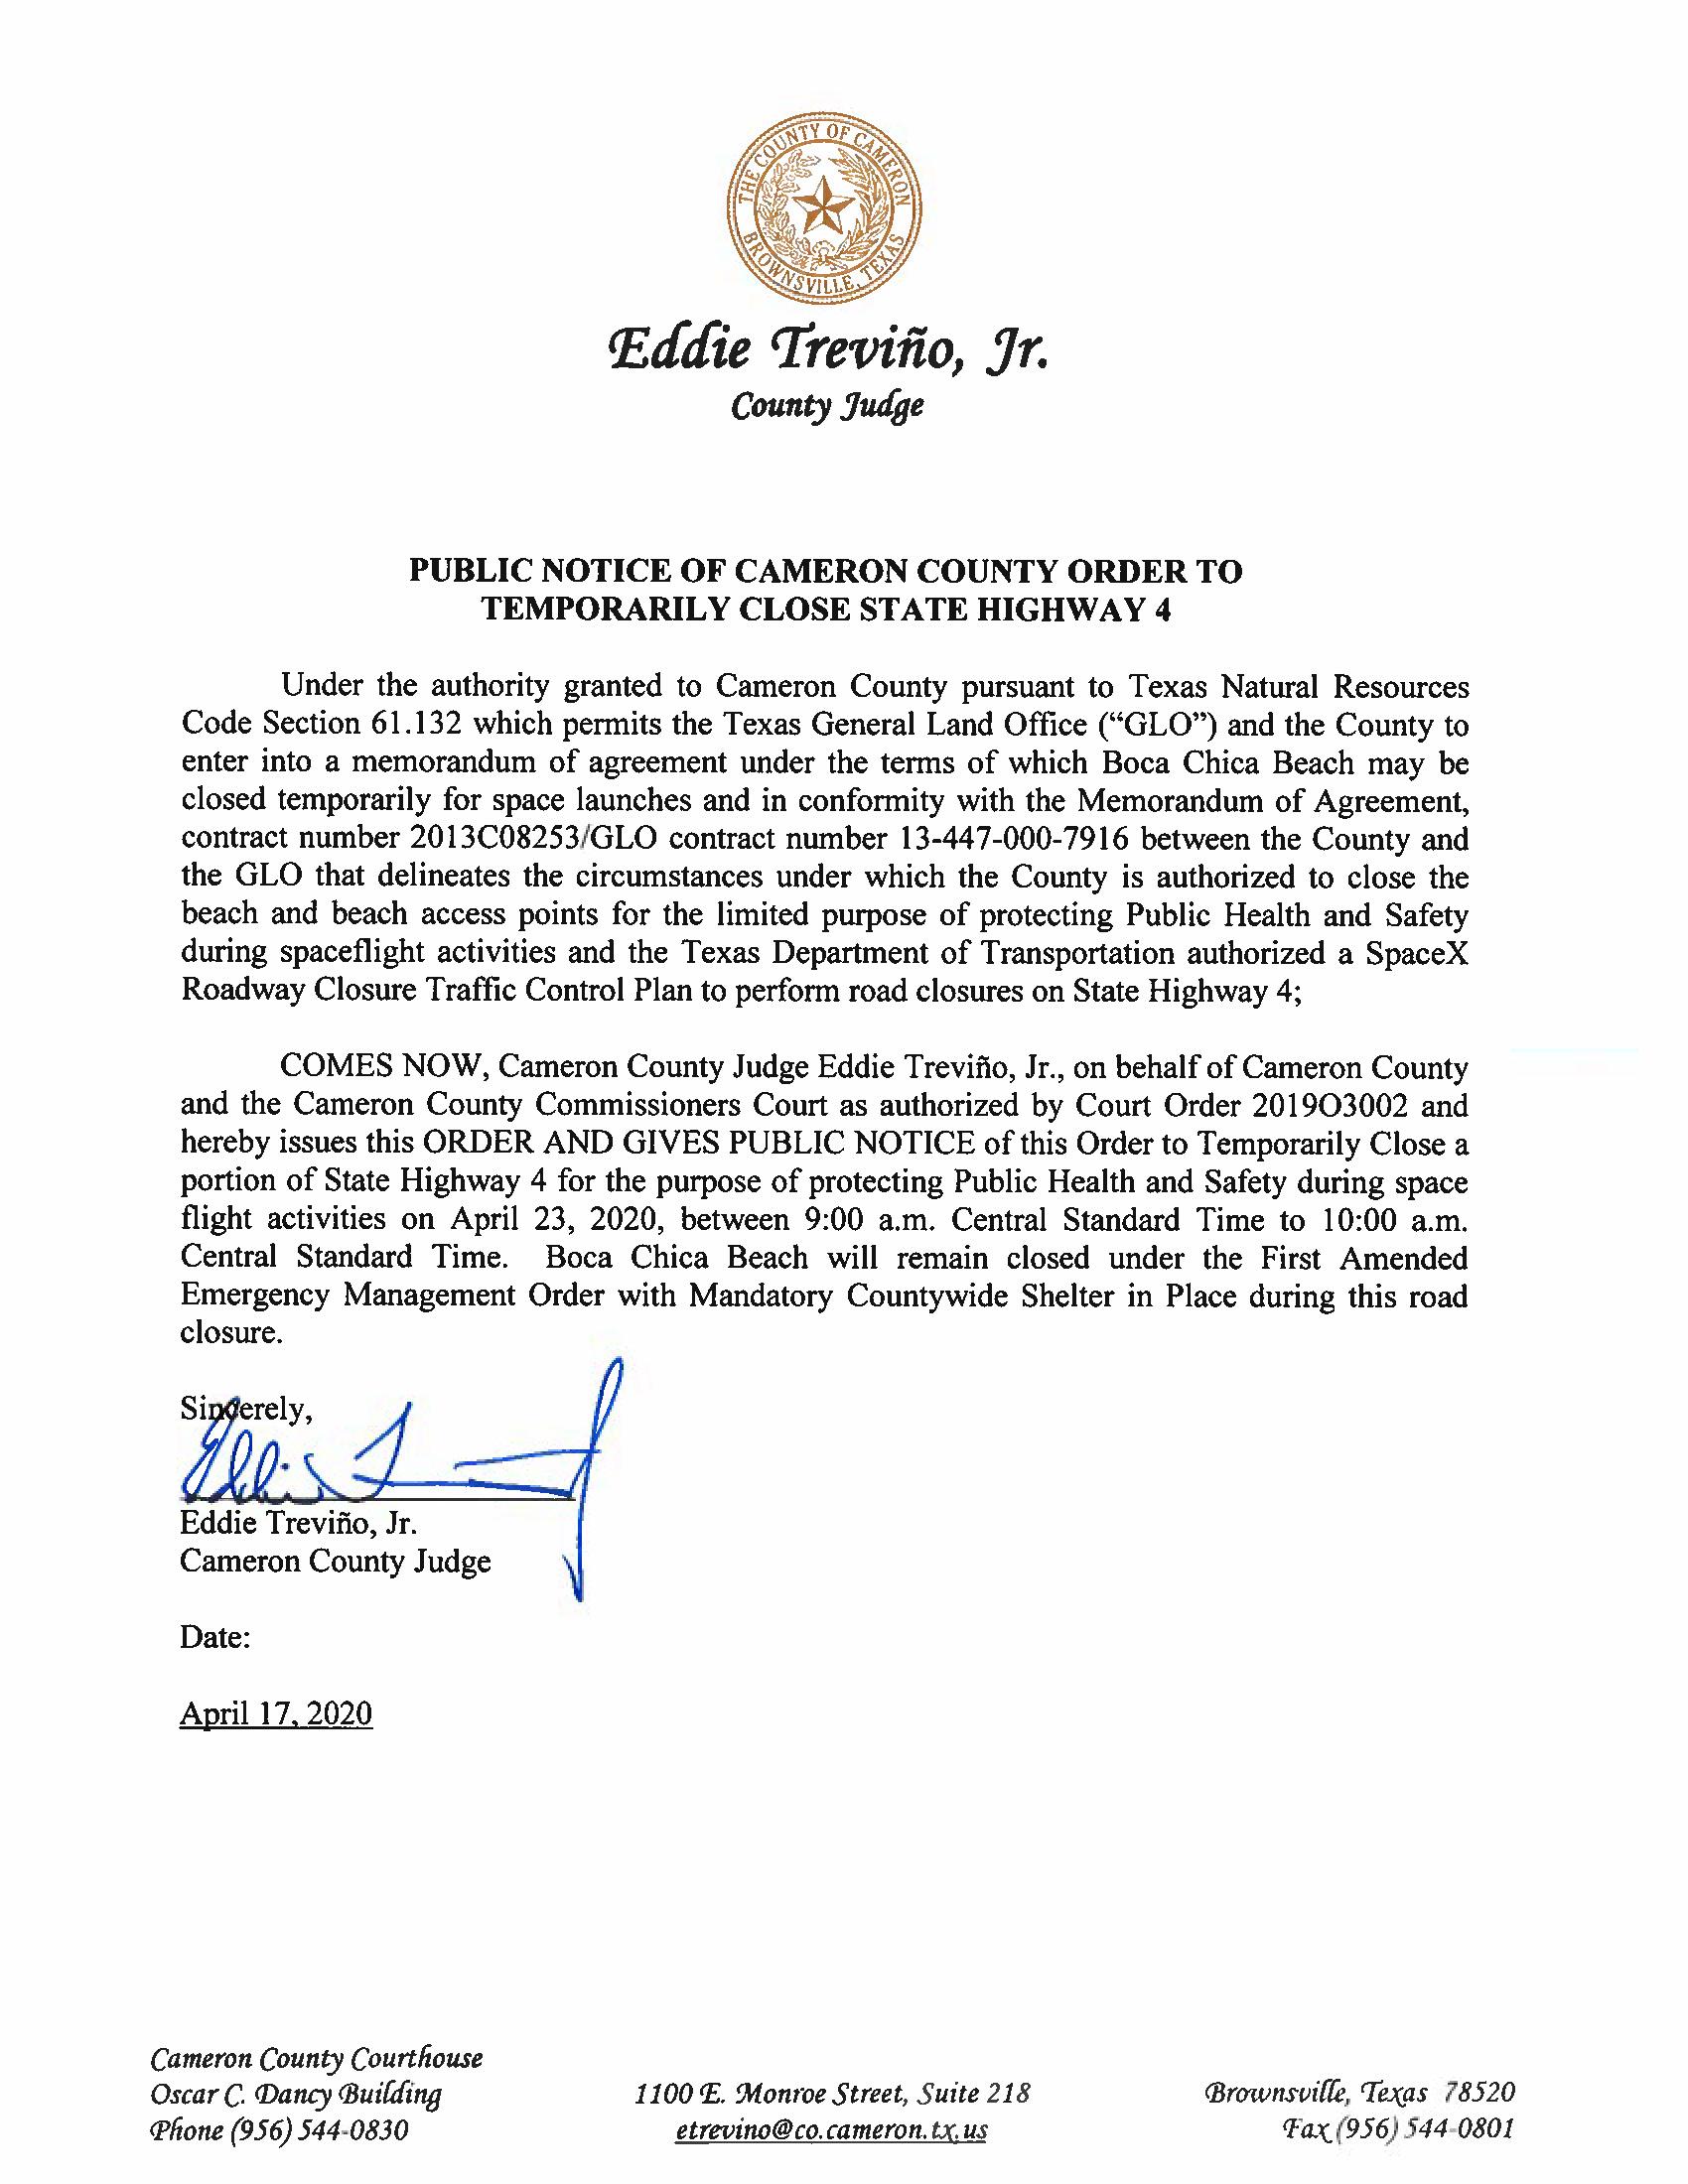 PUBLIC NOTICE OF CAMERON COUNTY ORDER TO TEMP. ROAD CLOSURE. 04.23.2020